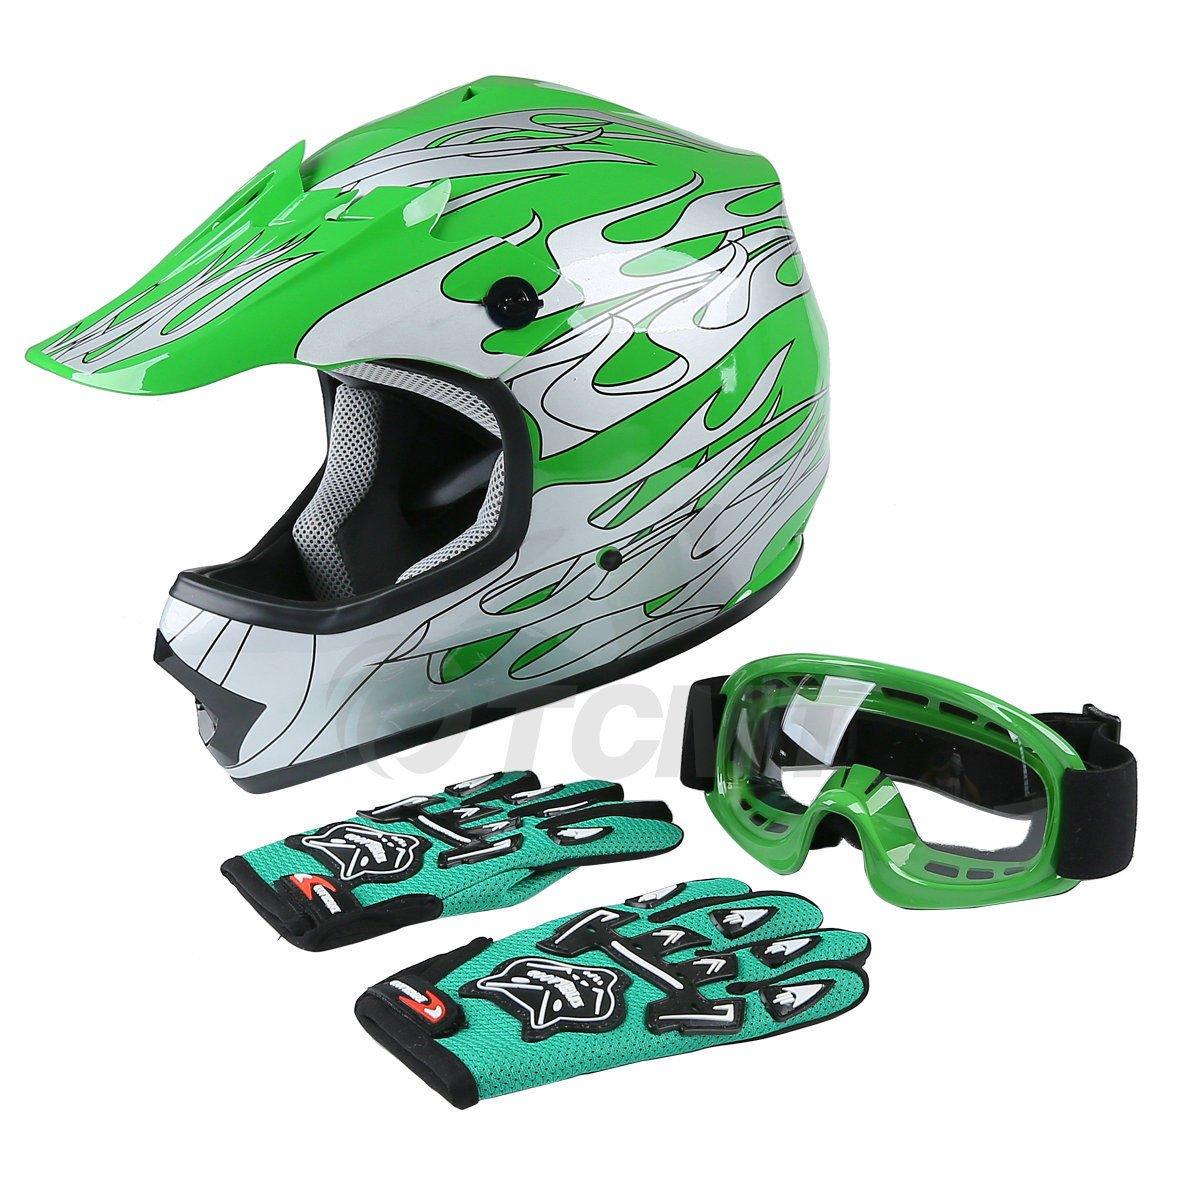 TCMT DOT Youth Green Flame Dirt Bike ATV Motocross Offroad Helmet +GoggleM XF270213-M-A002